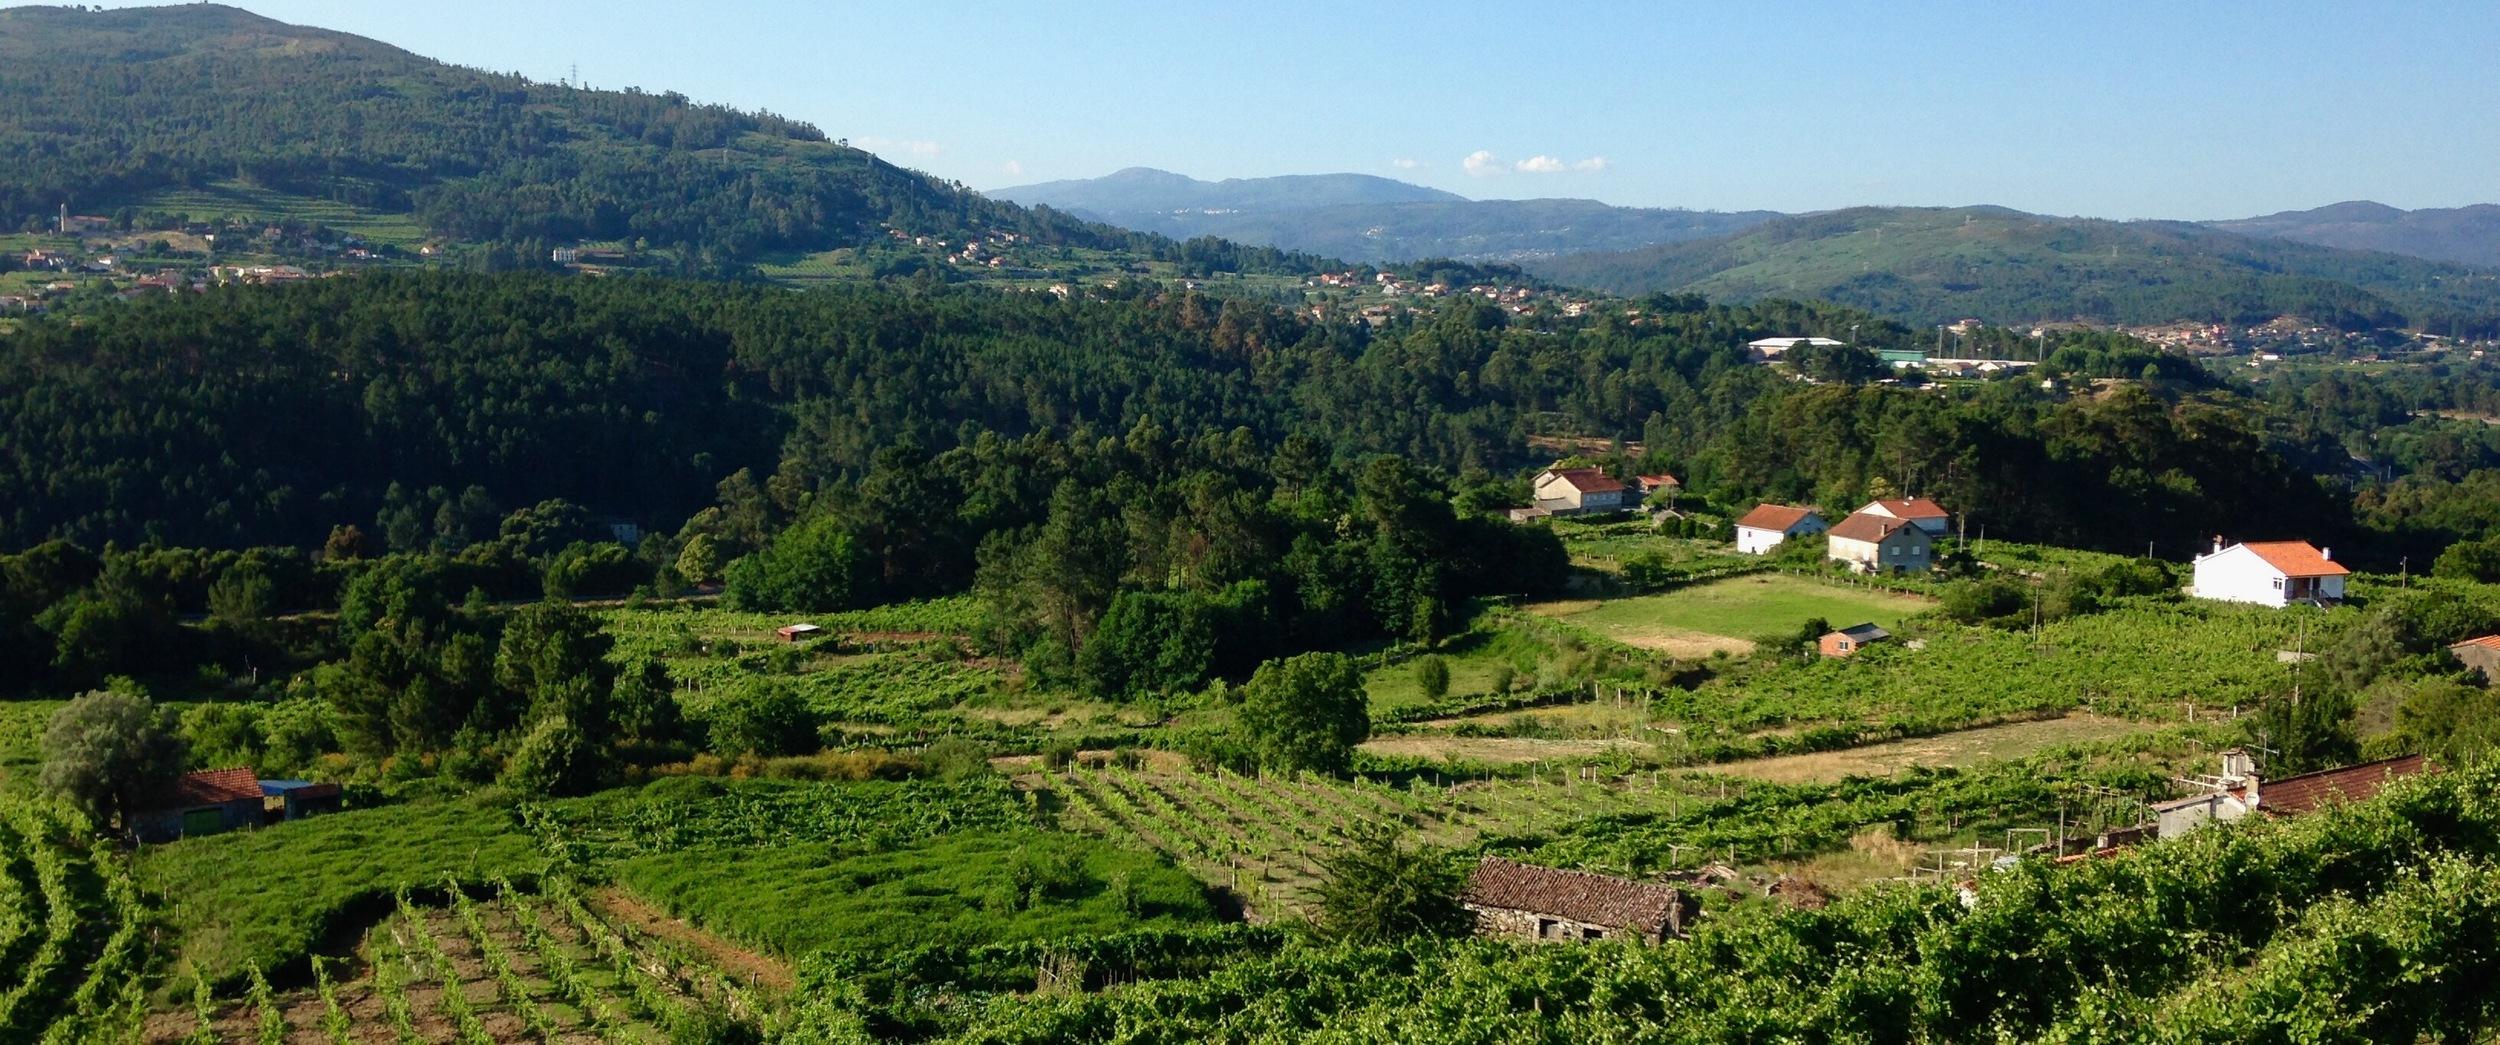 Soalheiro Winery, Melgaço, Portugal